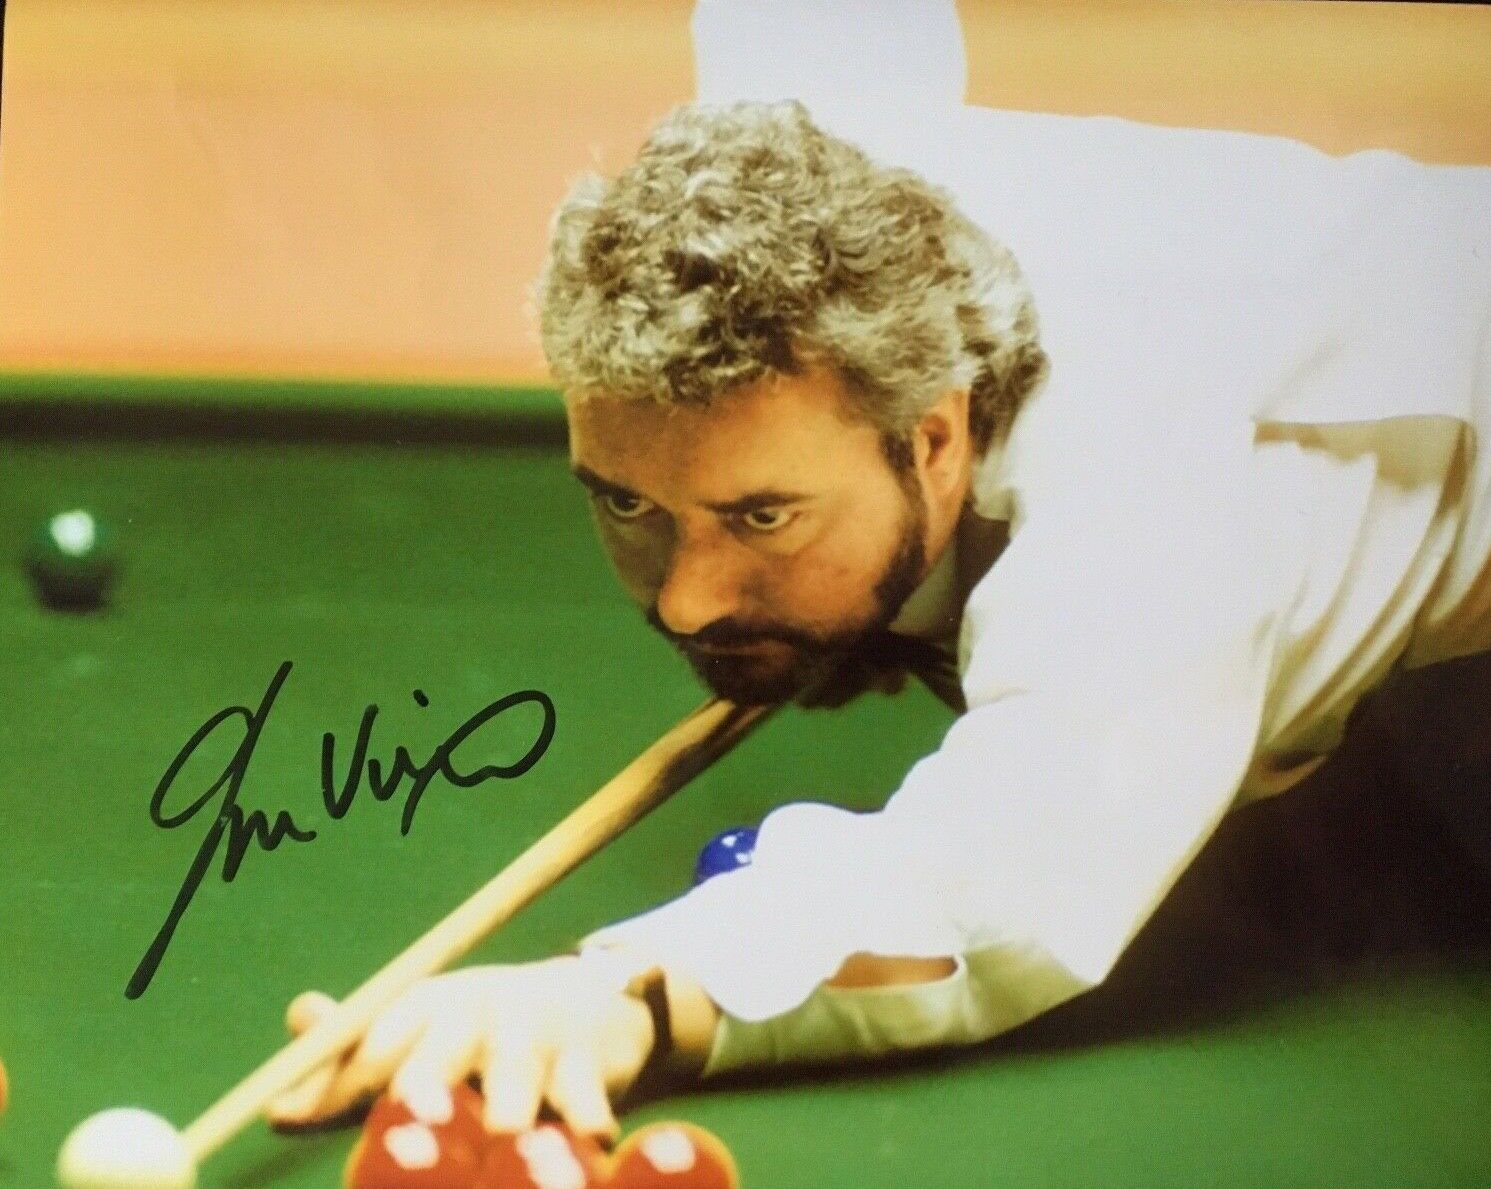 JOHN VIRGO - LEGENDARY ENGLISH SNOOKER PLAYER - EXCELLENT SIGNED PHOTO